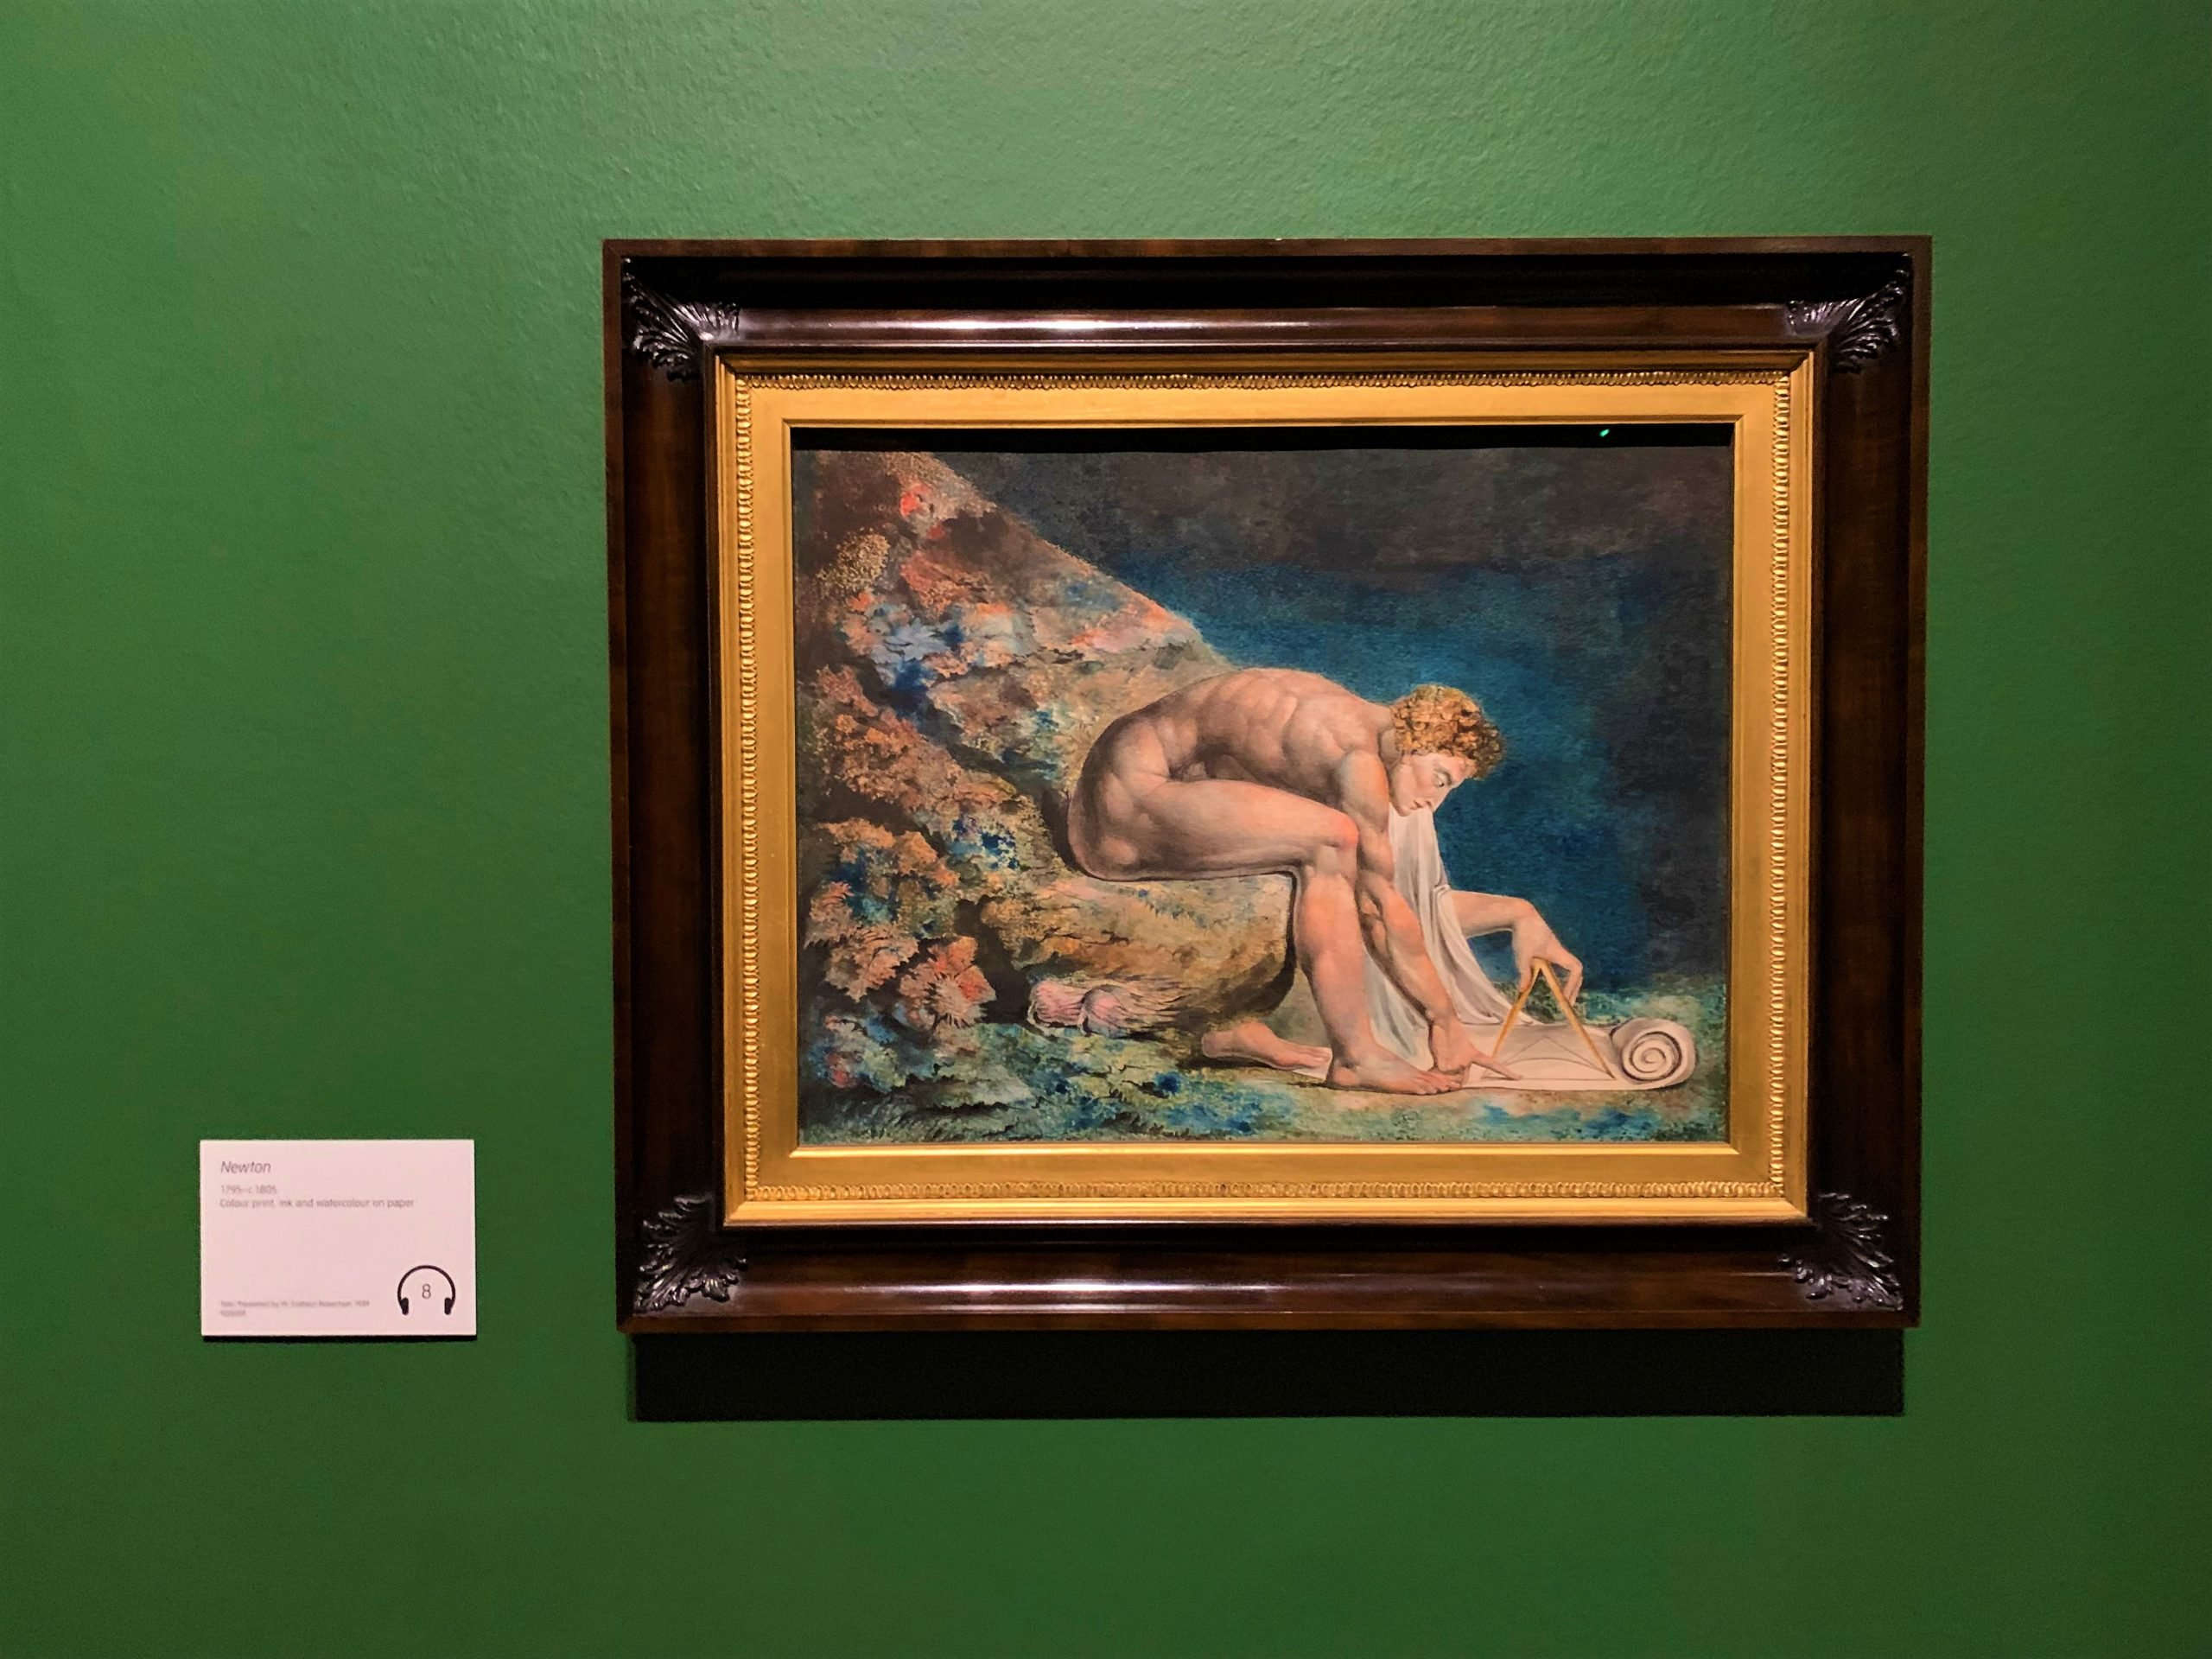 EgoSumArt visits William Blake Exhibition at the Tate Britain, London